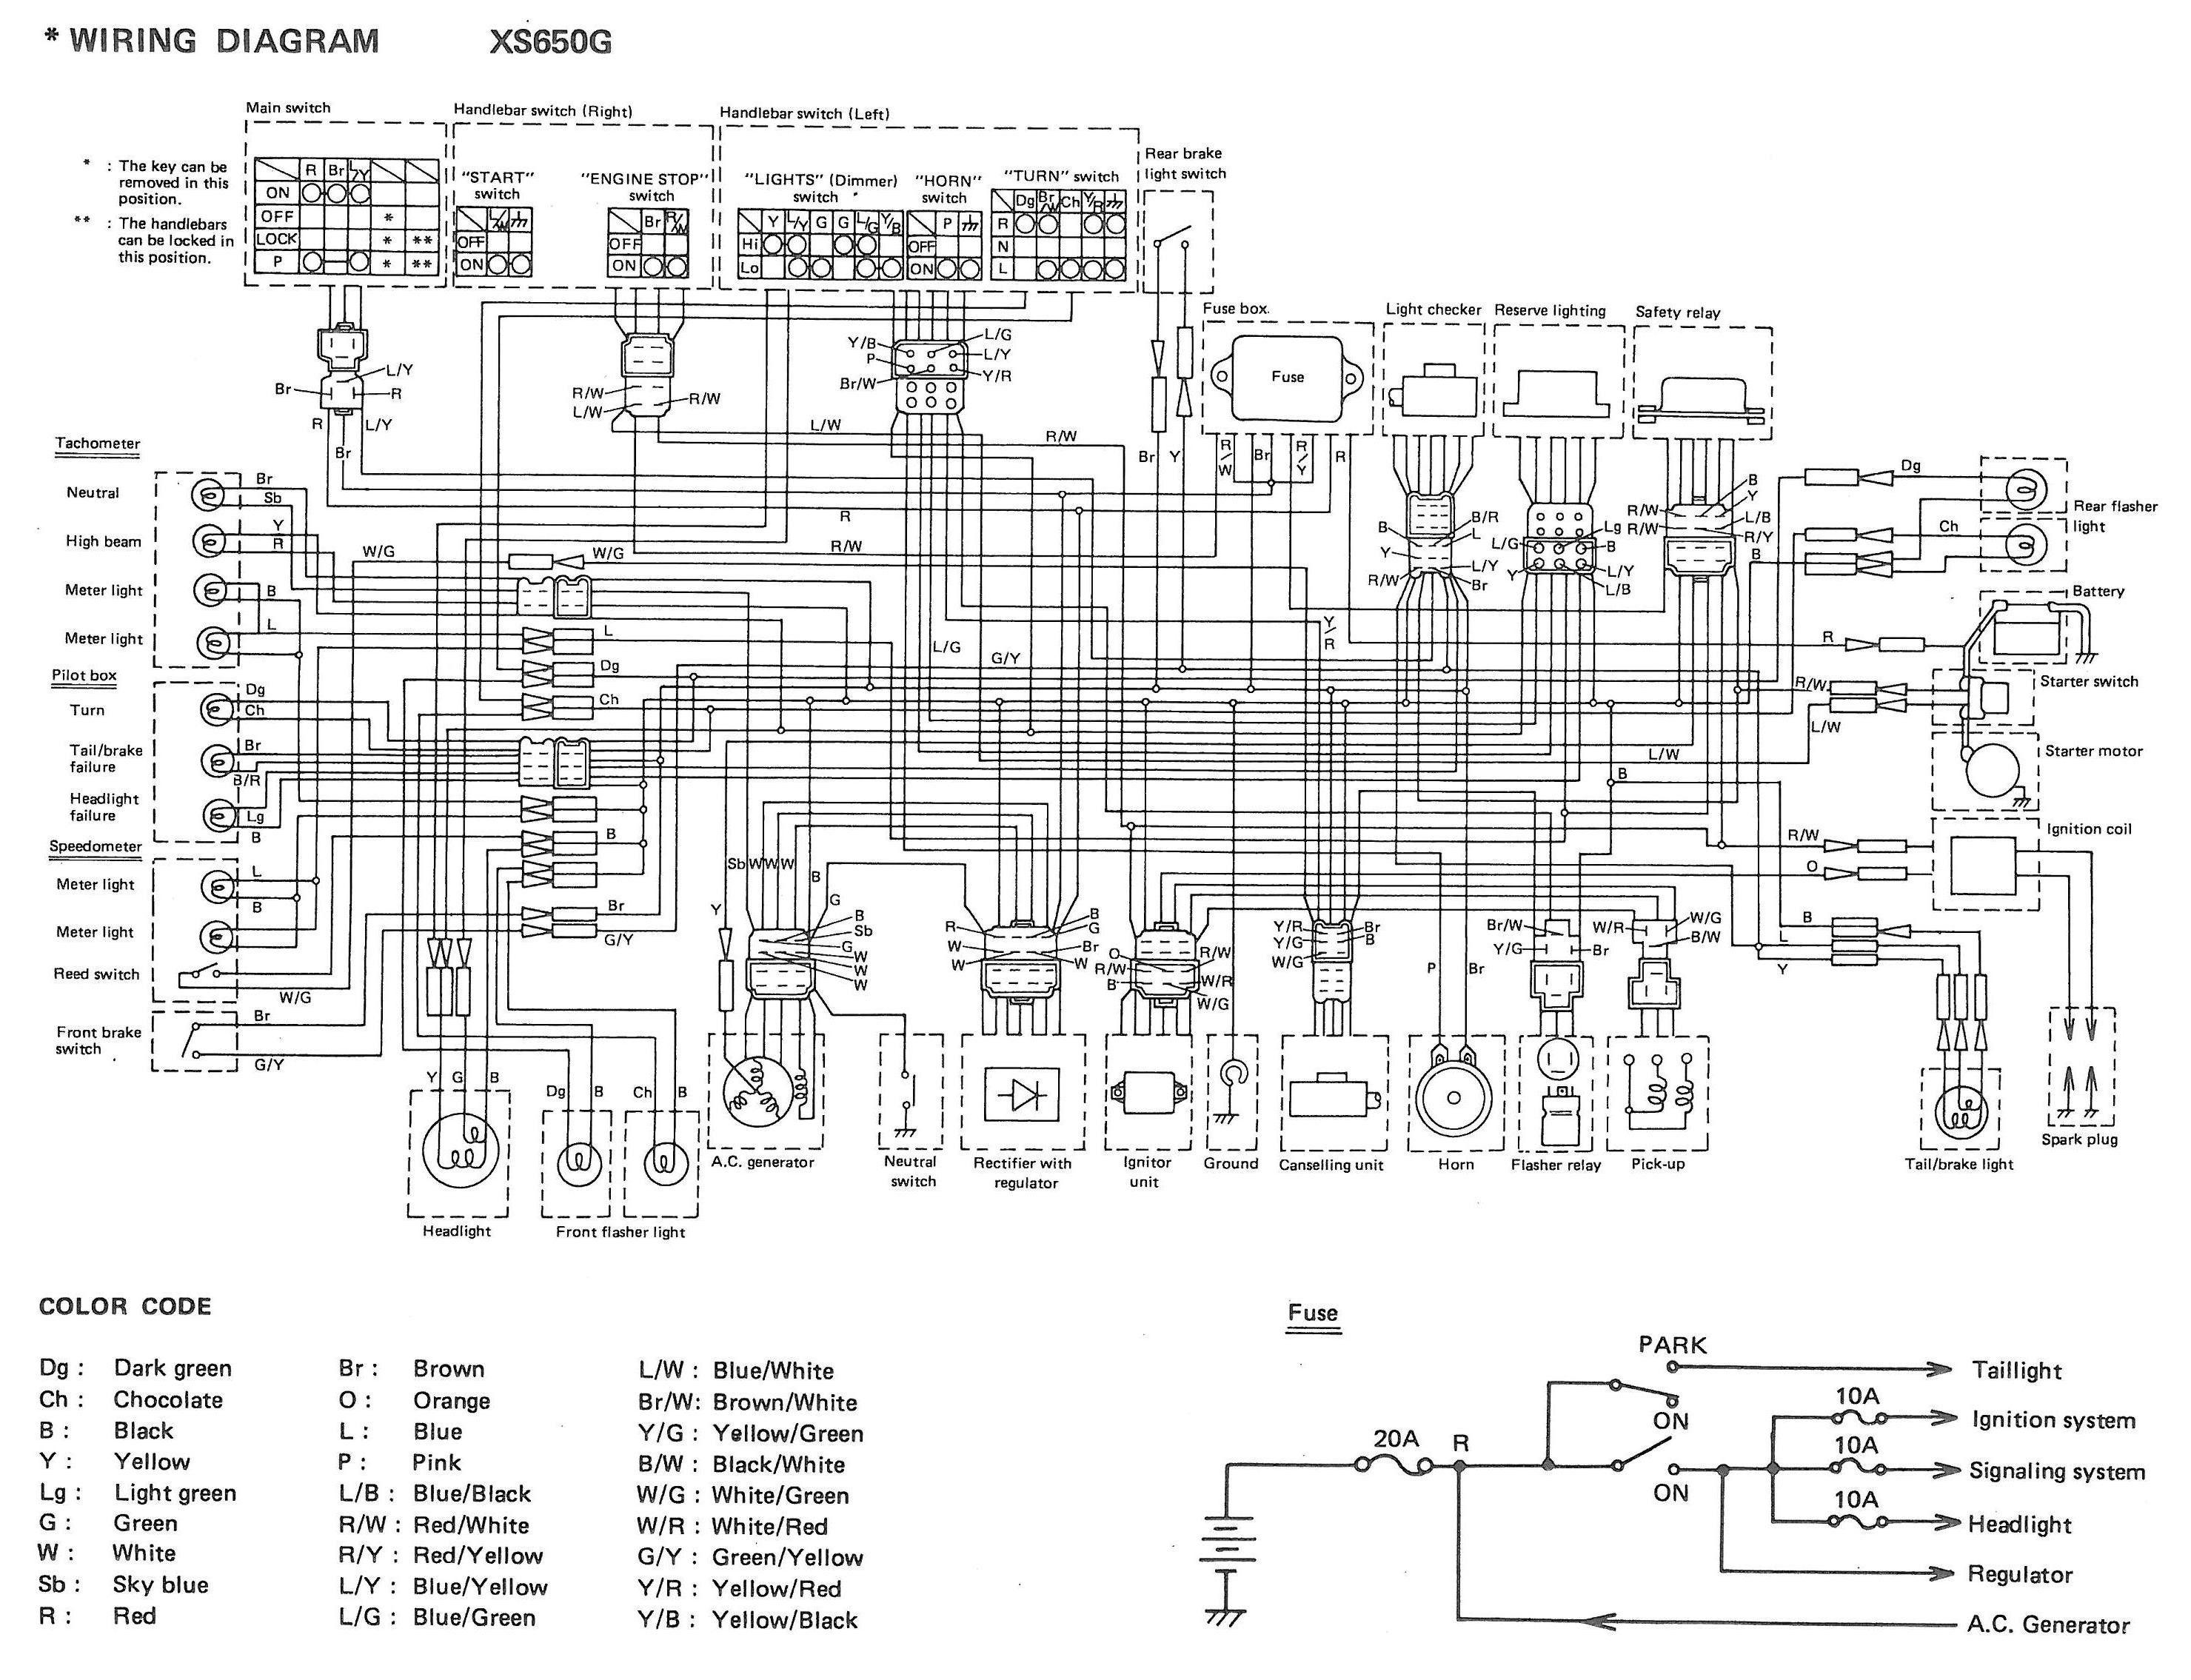 Xs650 Engine Diagram In 2020 Xs650 Diagram Ducati Cafe Racer